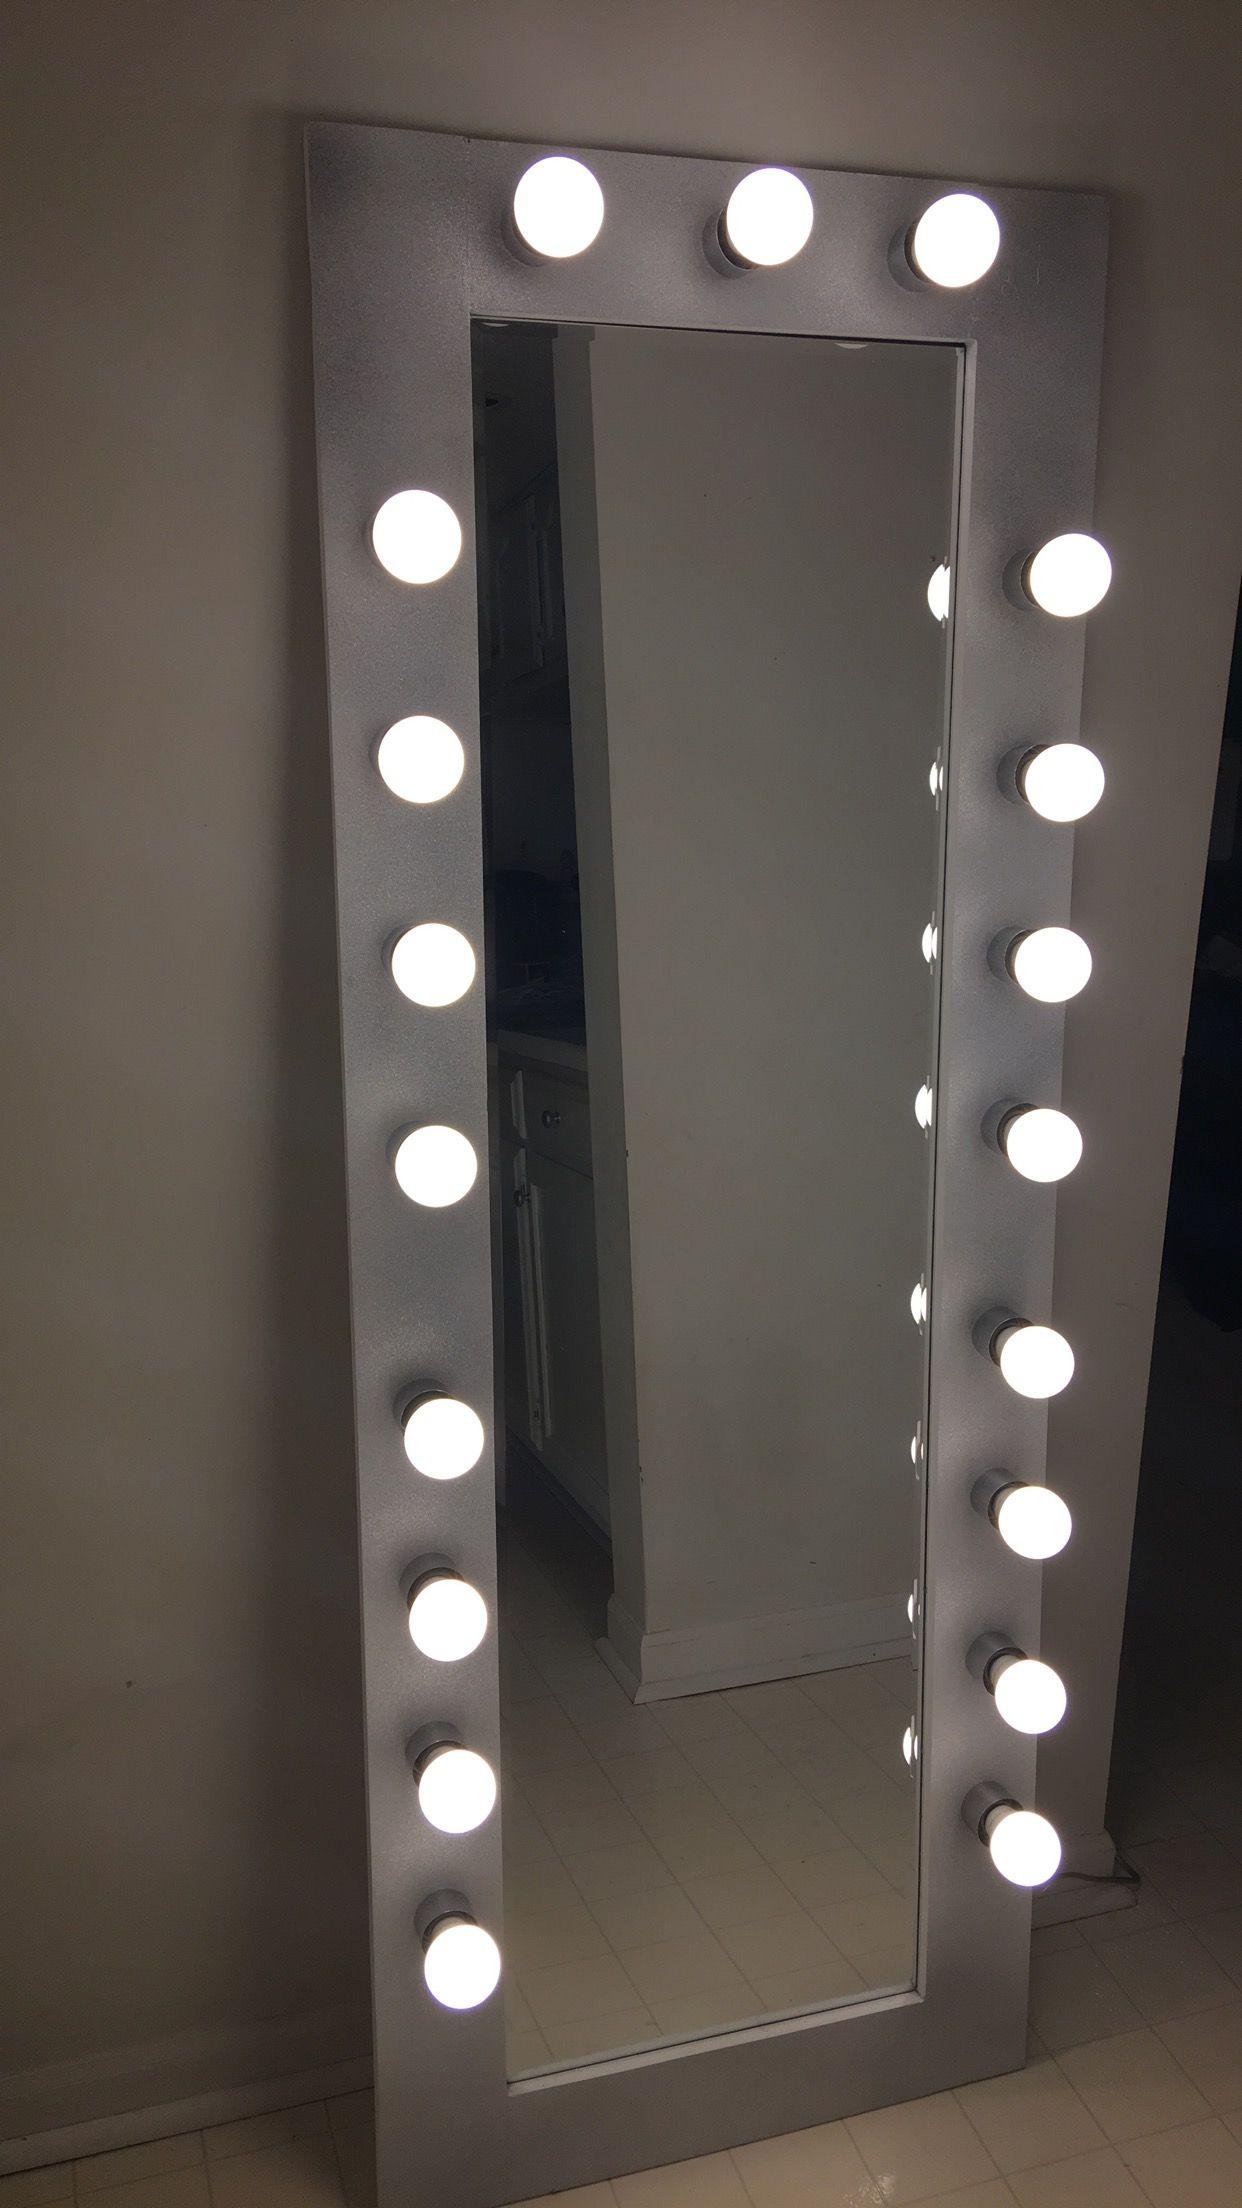 Full Body Vanity Mirror Lights